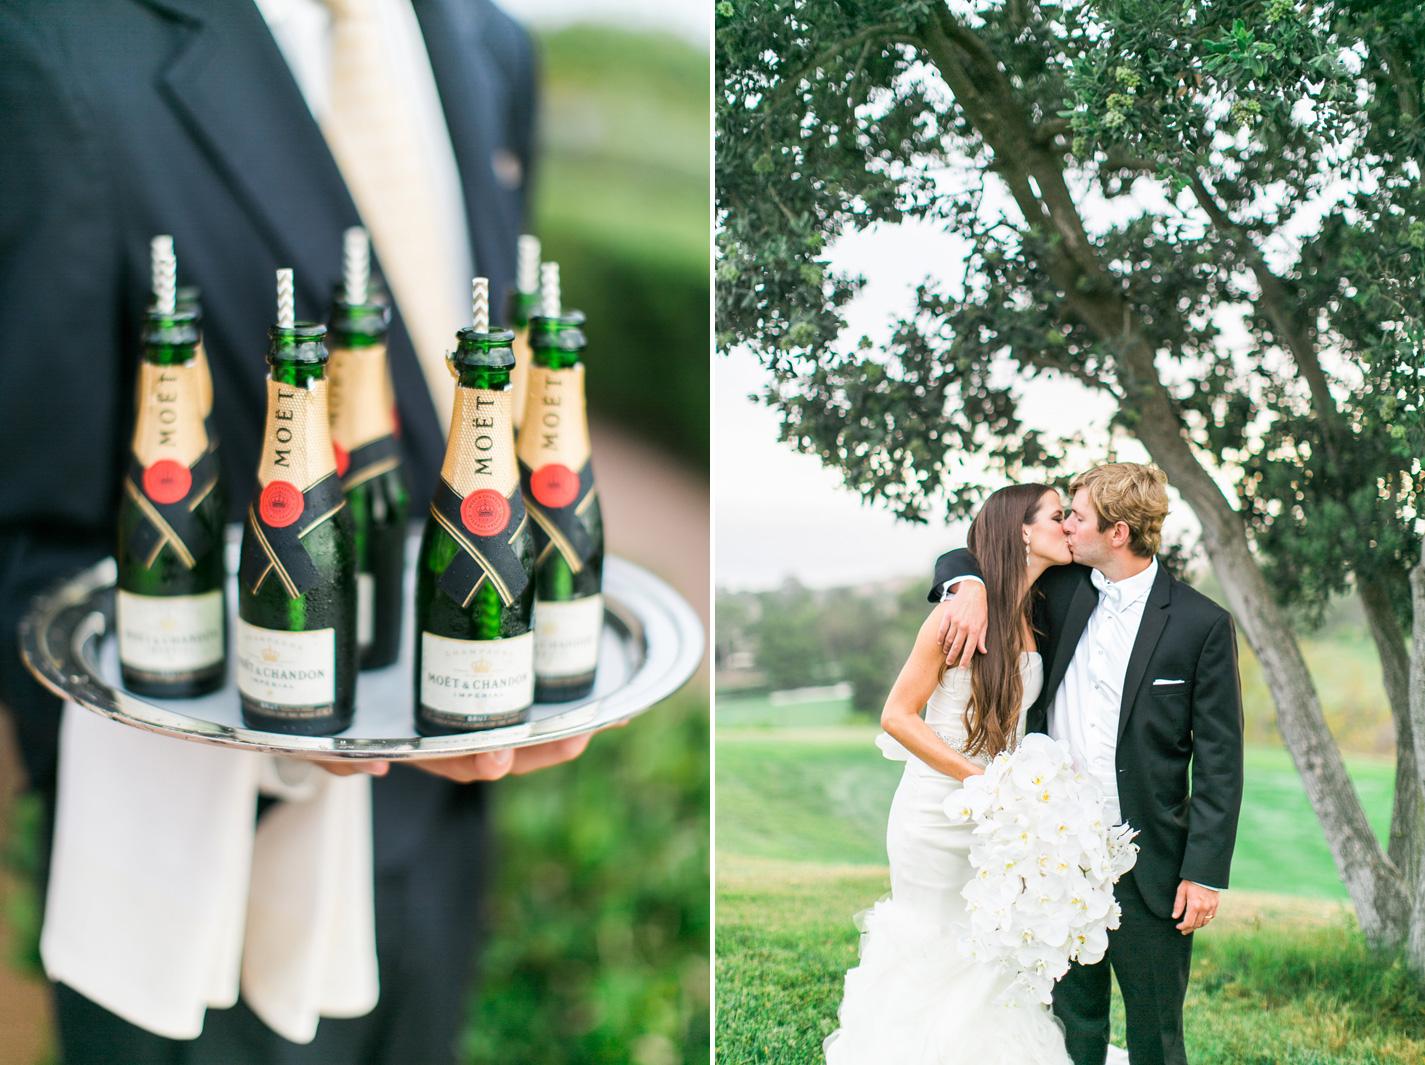 Pelican-Hill-Wedding-Fine-Art-20